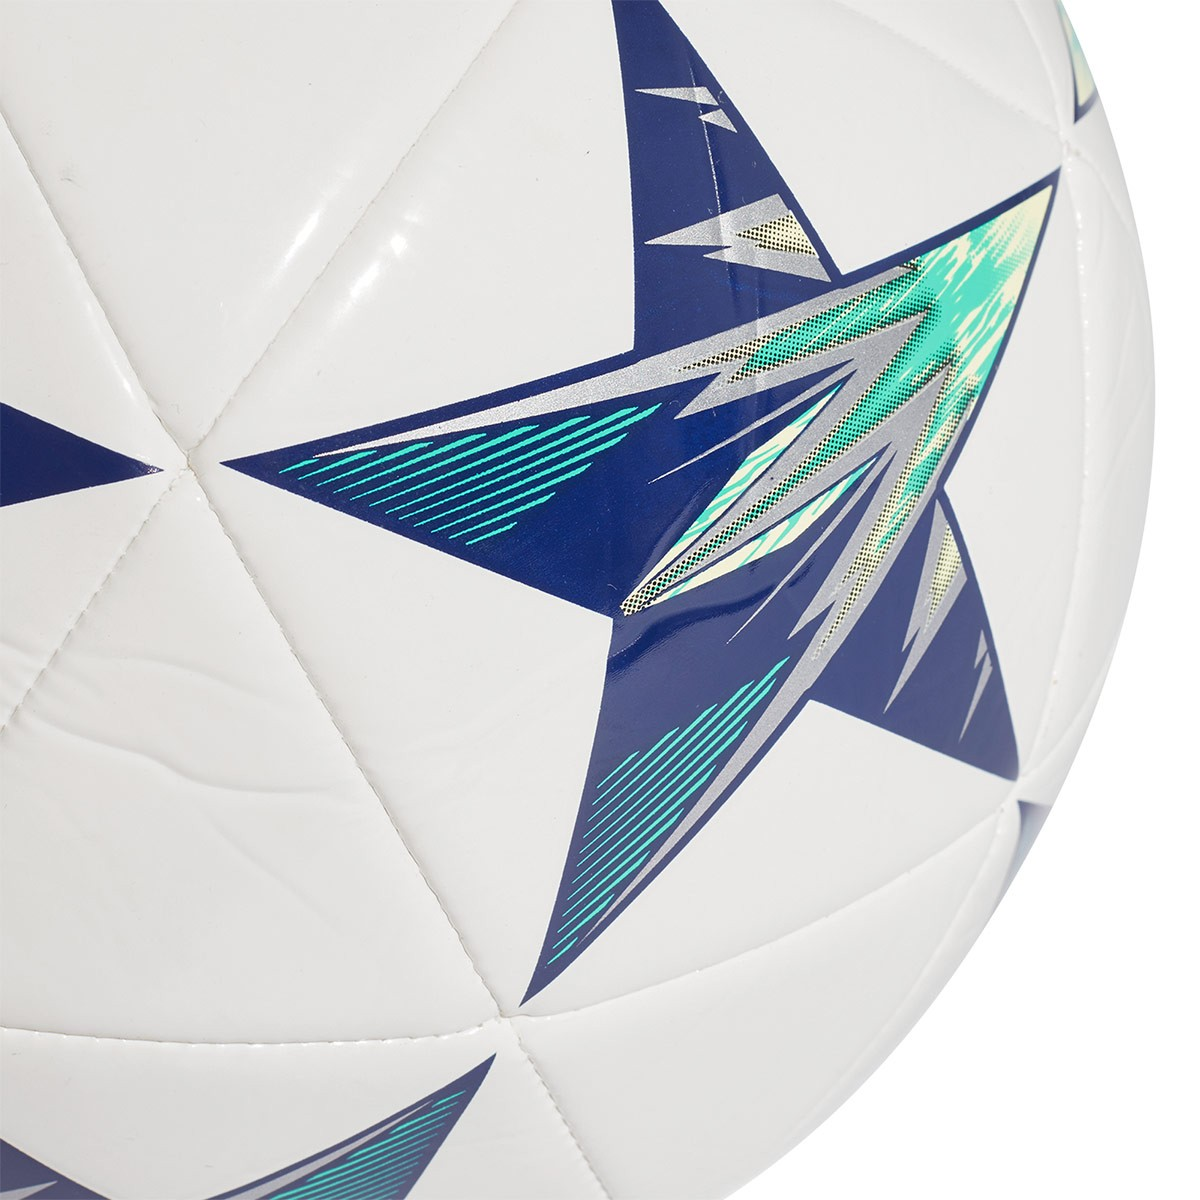 6bab85d3ff97c Balón adidas Finale Kiev Capitano White-Black-Unity ink-High green-Aero  green-S - Tienda de fútbol Fútbol Emotion